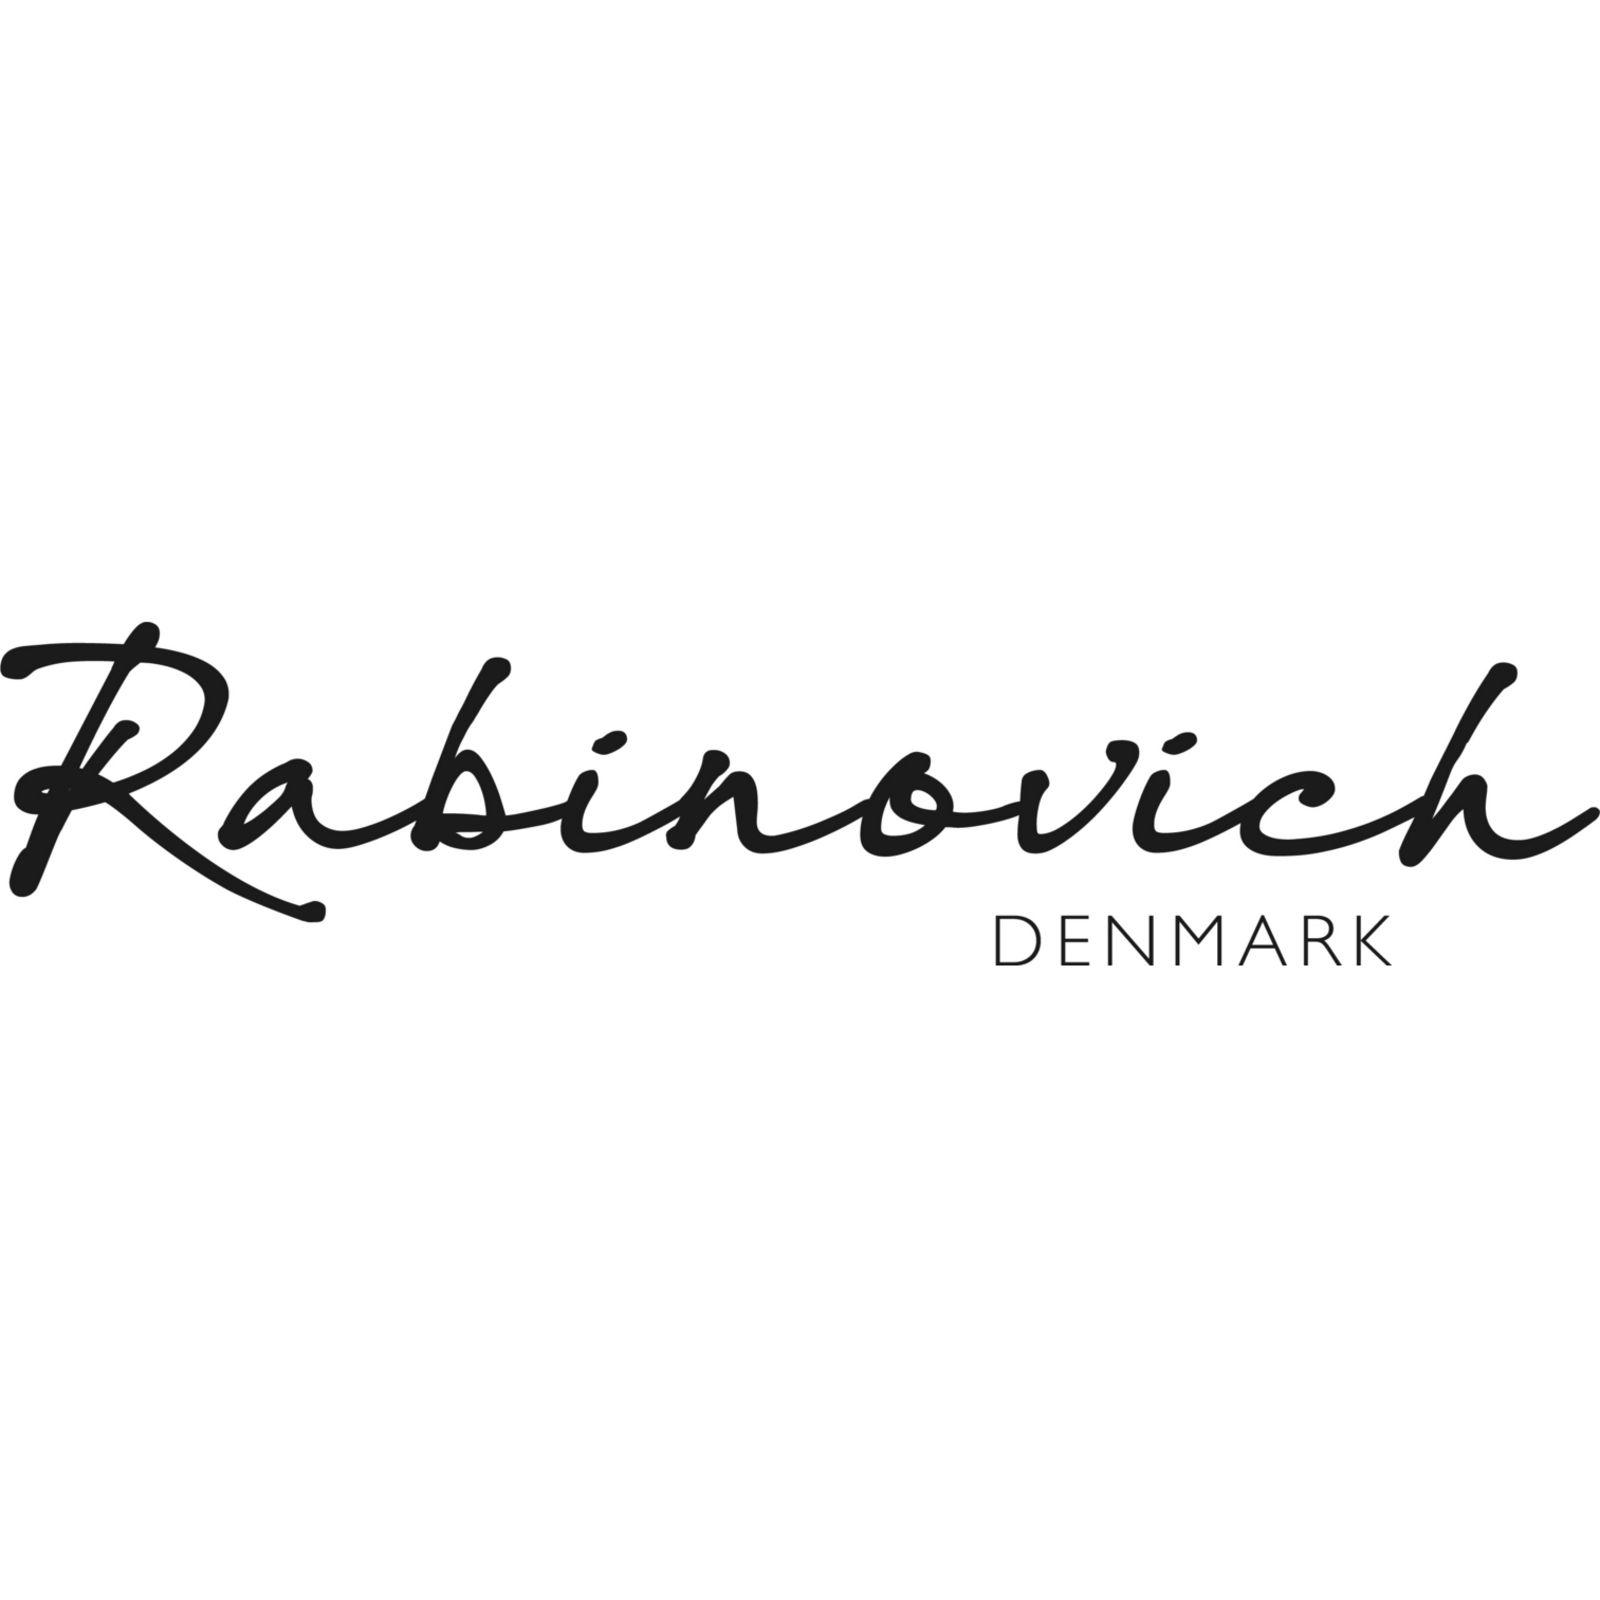 Rabinovich Denmark